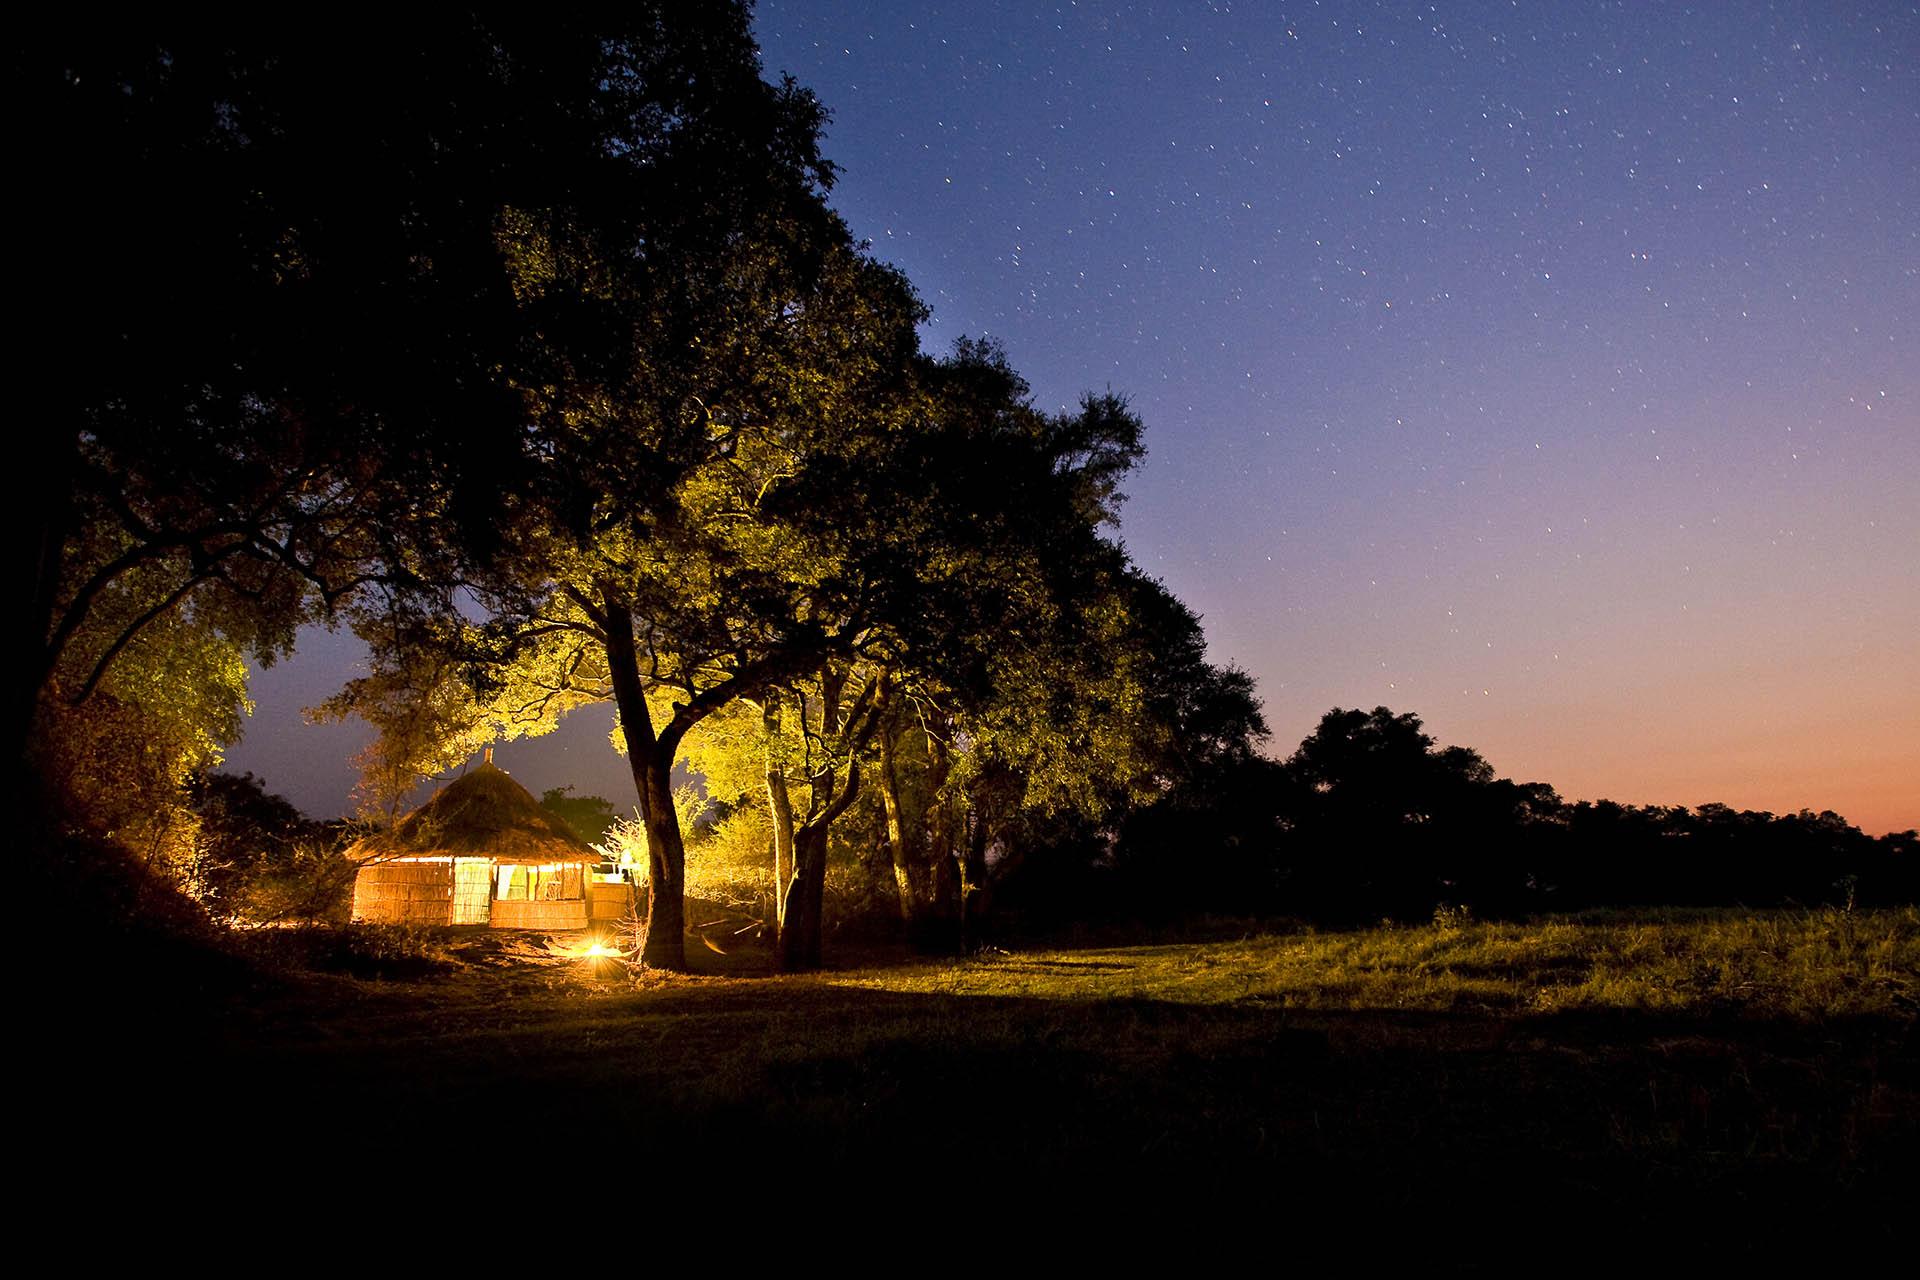 malawi zambia wet-wild-south-luangwa-lake-malawi-7-nights-malawian-style-malawi-adventures-experiences-specialist-tour-operator-crocodile-camp-sunrise